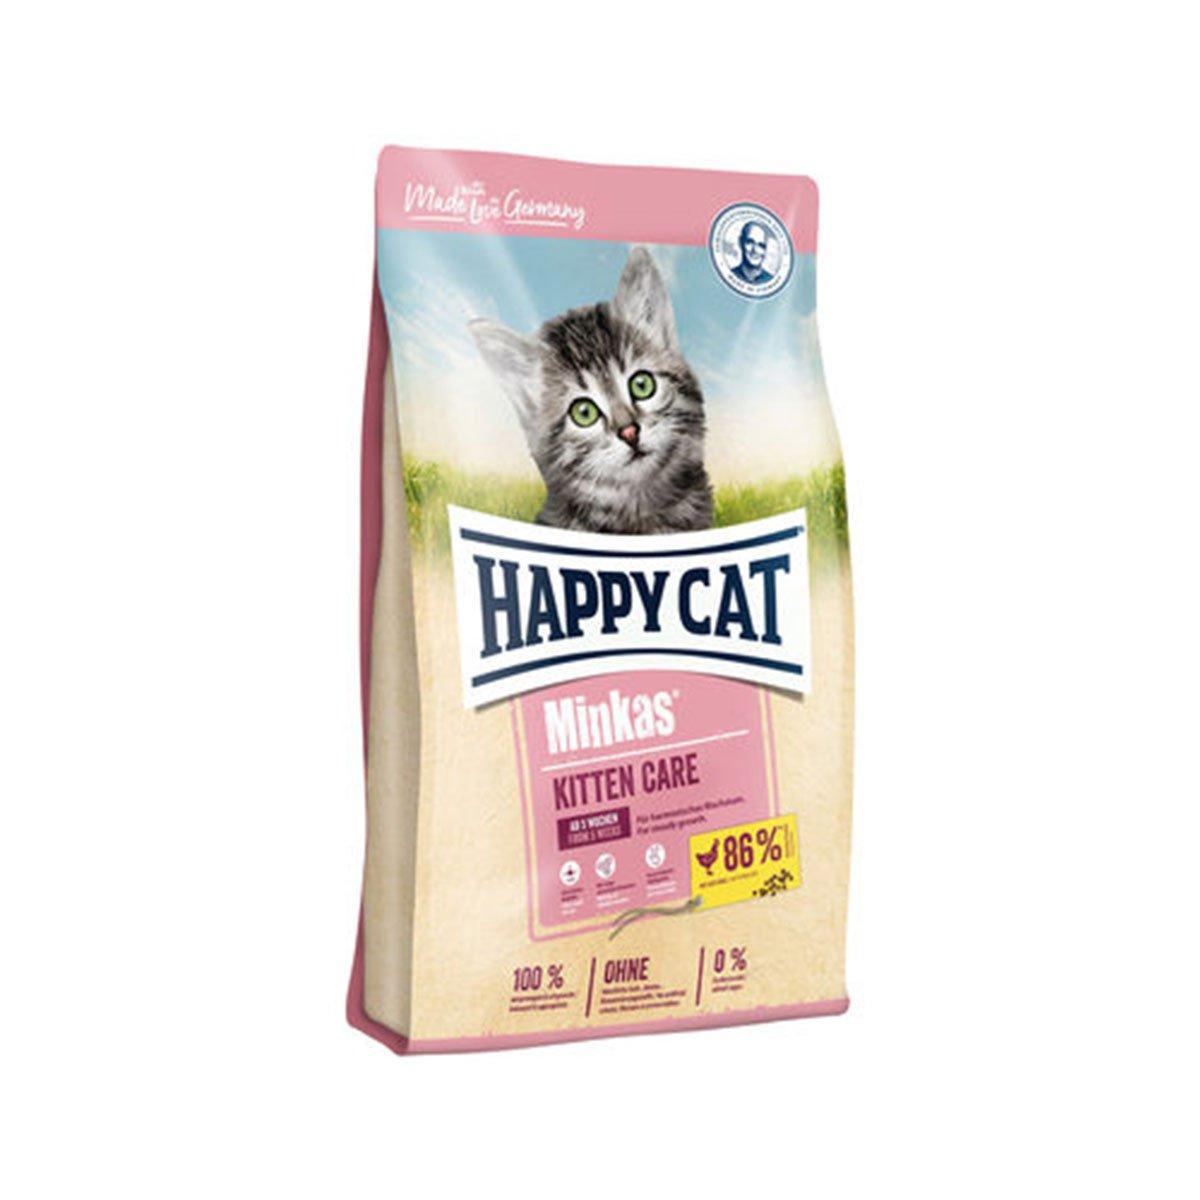 غذای خشک گربه هپی کت مدل KITTEN وزن 1.5 کیلوگرم